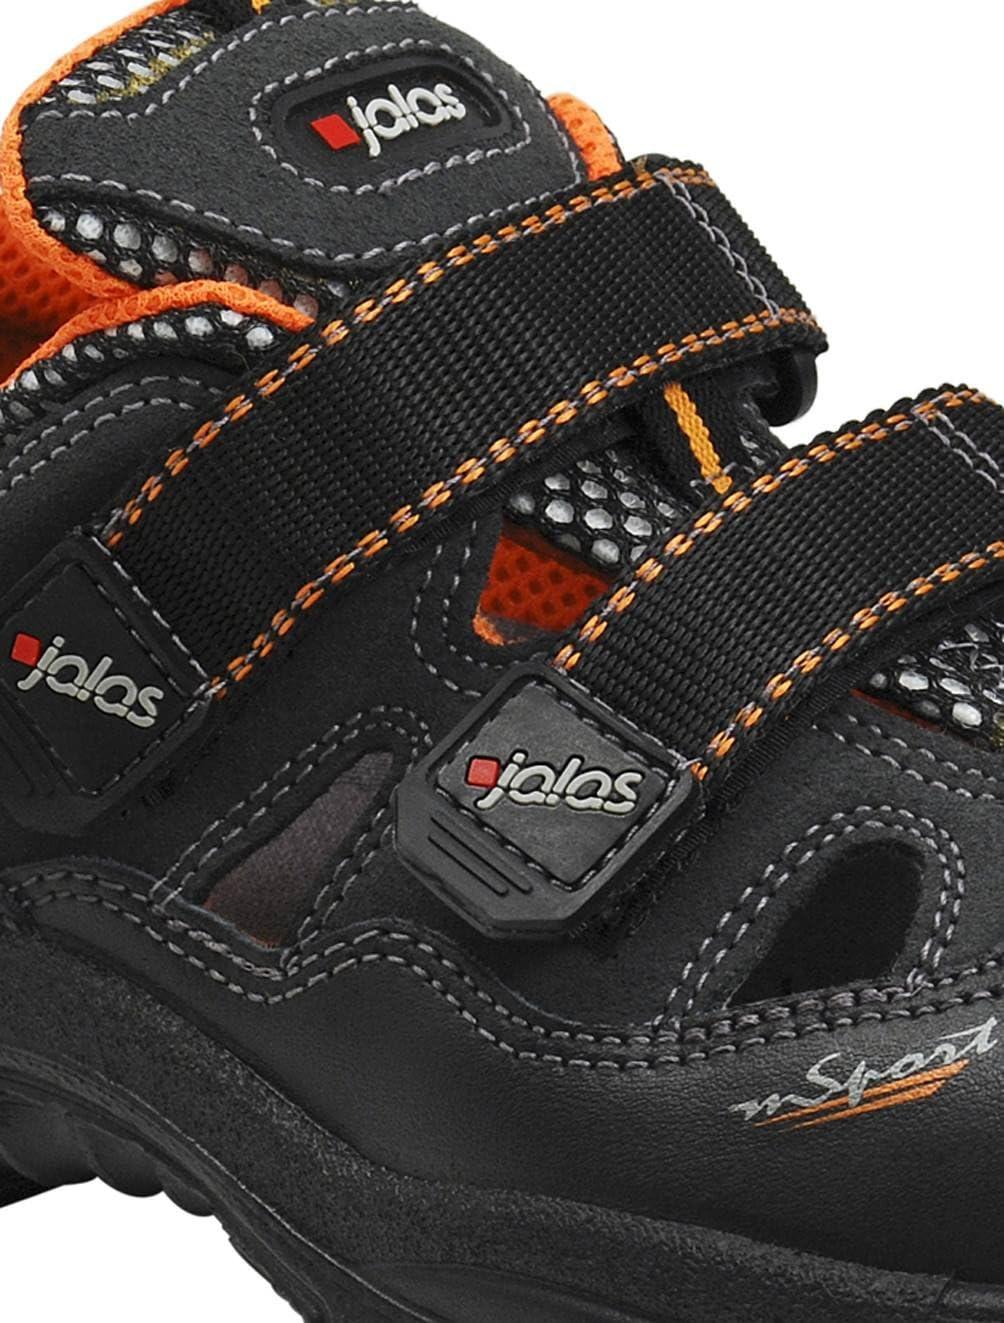 Gr/ö/ße 42 schwarz//orange Ejendals 3408A-42 Sicherheitssandalen Jalas 3408A Monza Sport